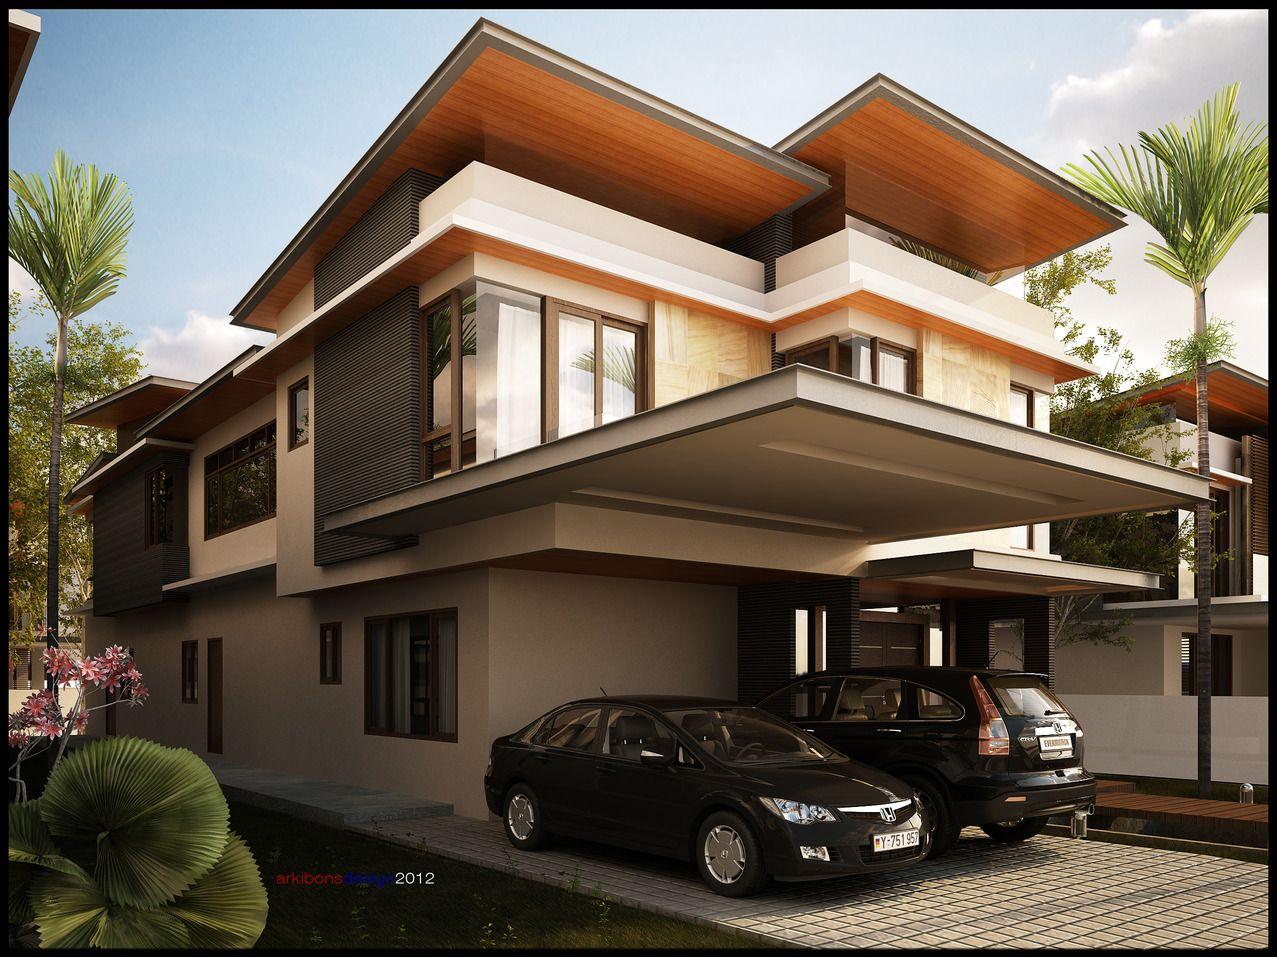 http://www.cgpinoy/t23112-bahay-ni-jeff-modern-tropical